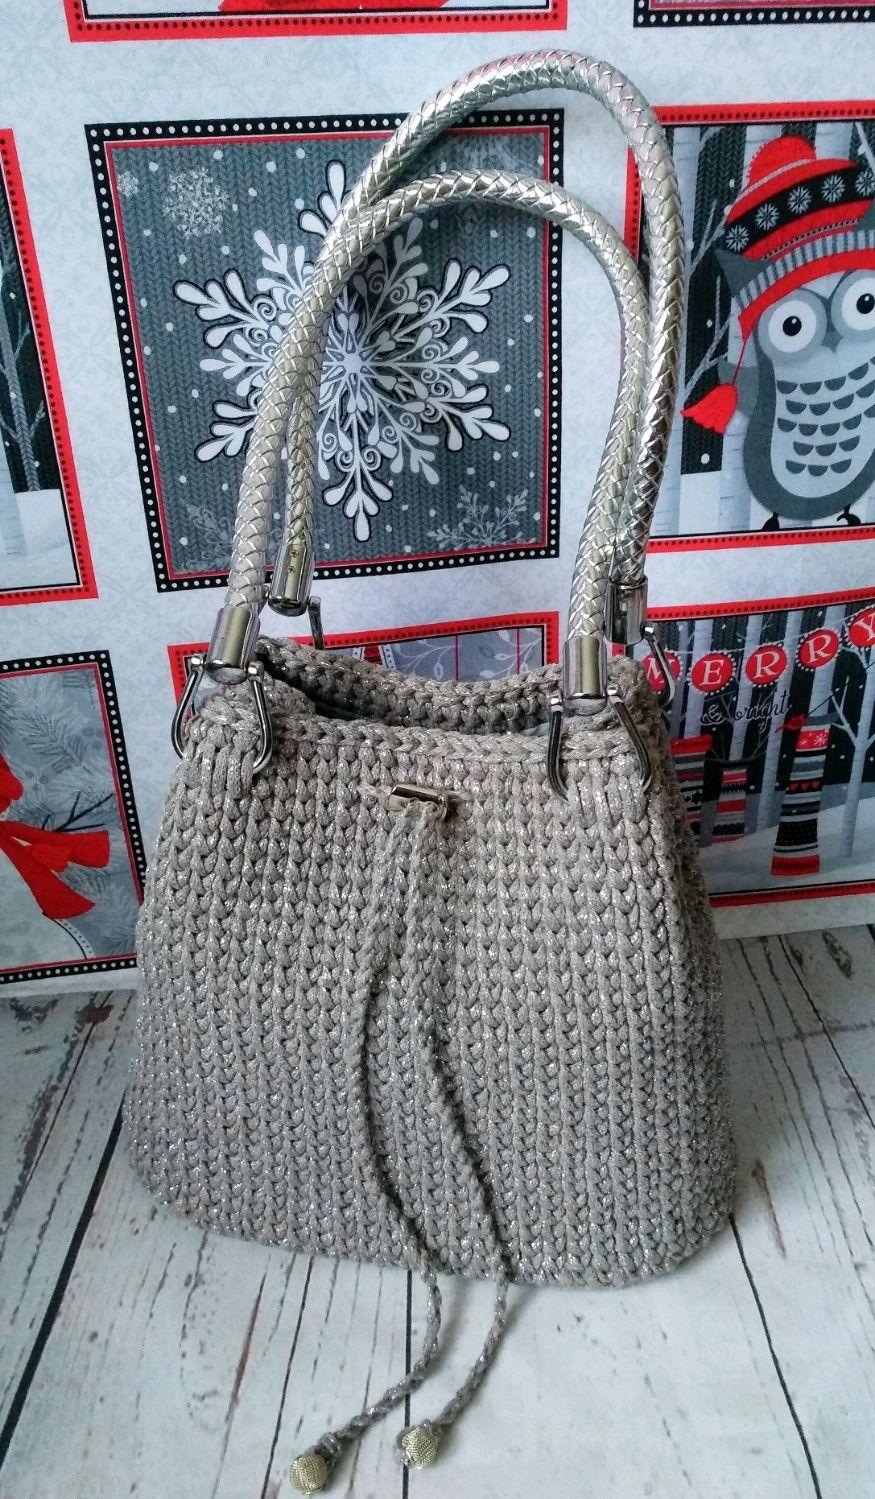 eccf315e7061 Вязаная сумка